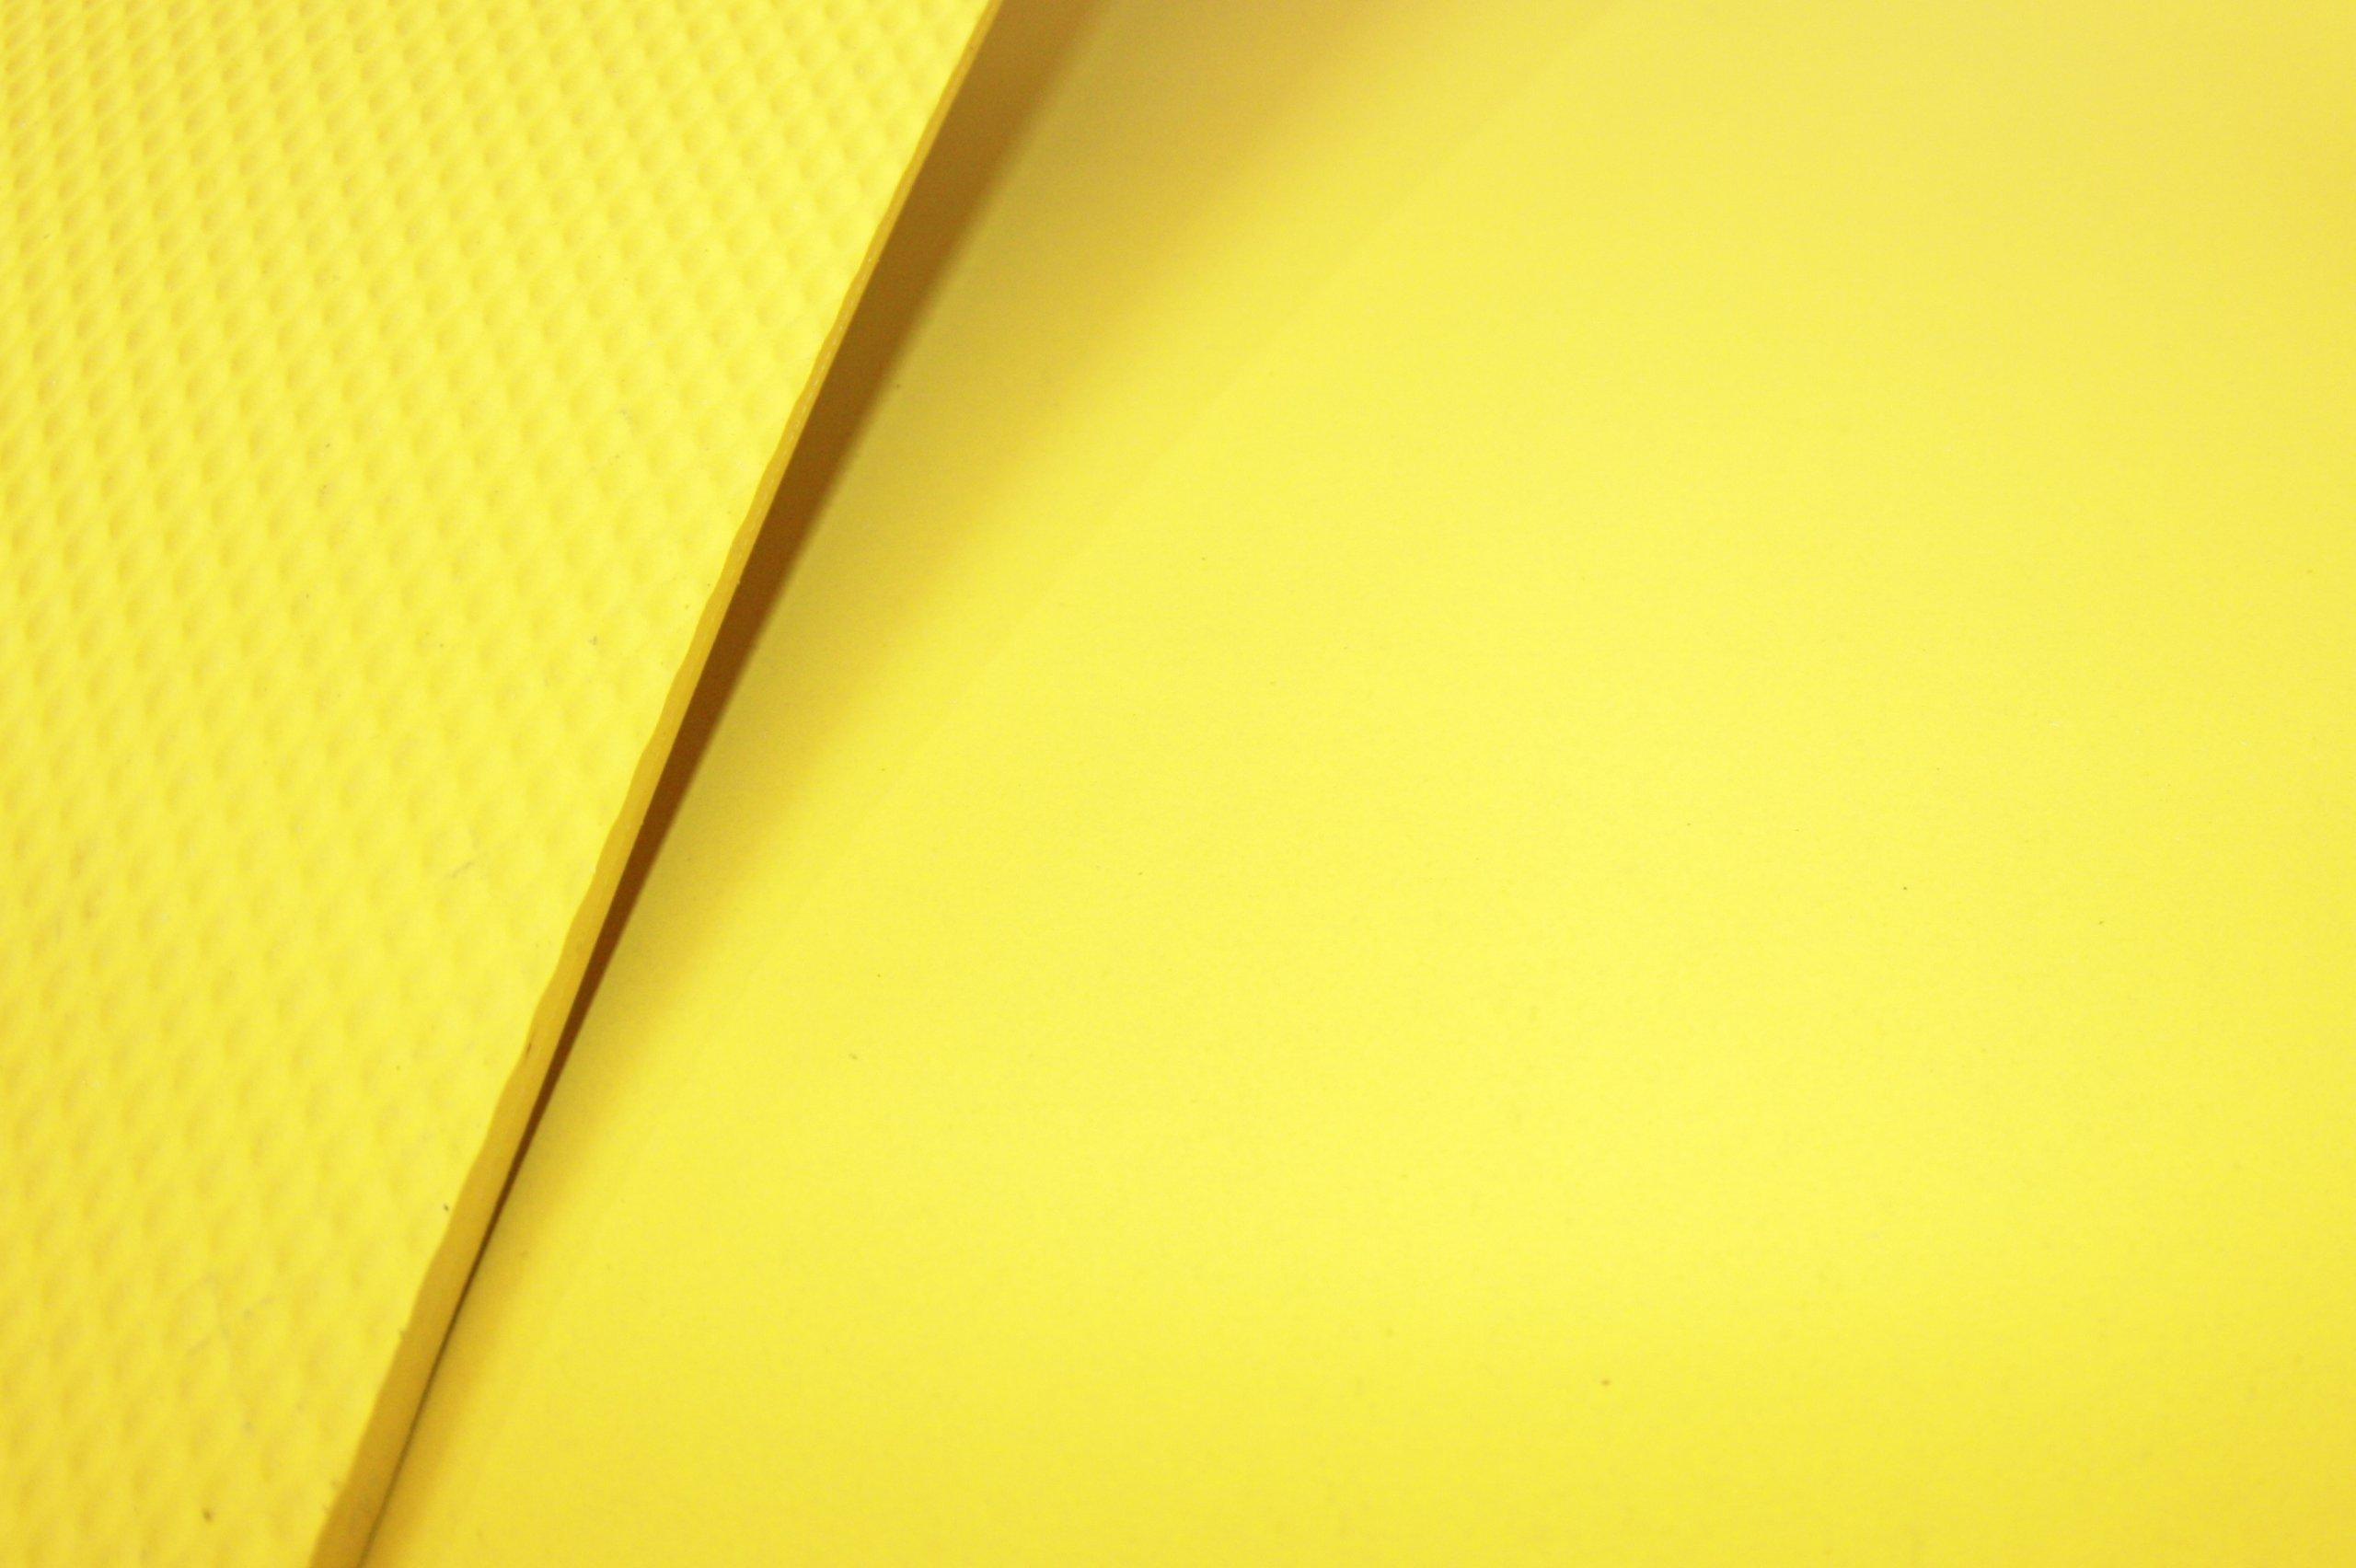 Advanced Custom Manufacturing 232-250-3x5-Y FOD Shield Rubberized Work Matting, 60'' Length x 36'' Width x 0.250'' Thick, Yellow